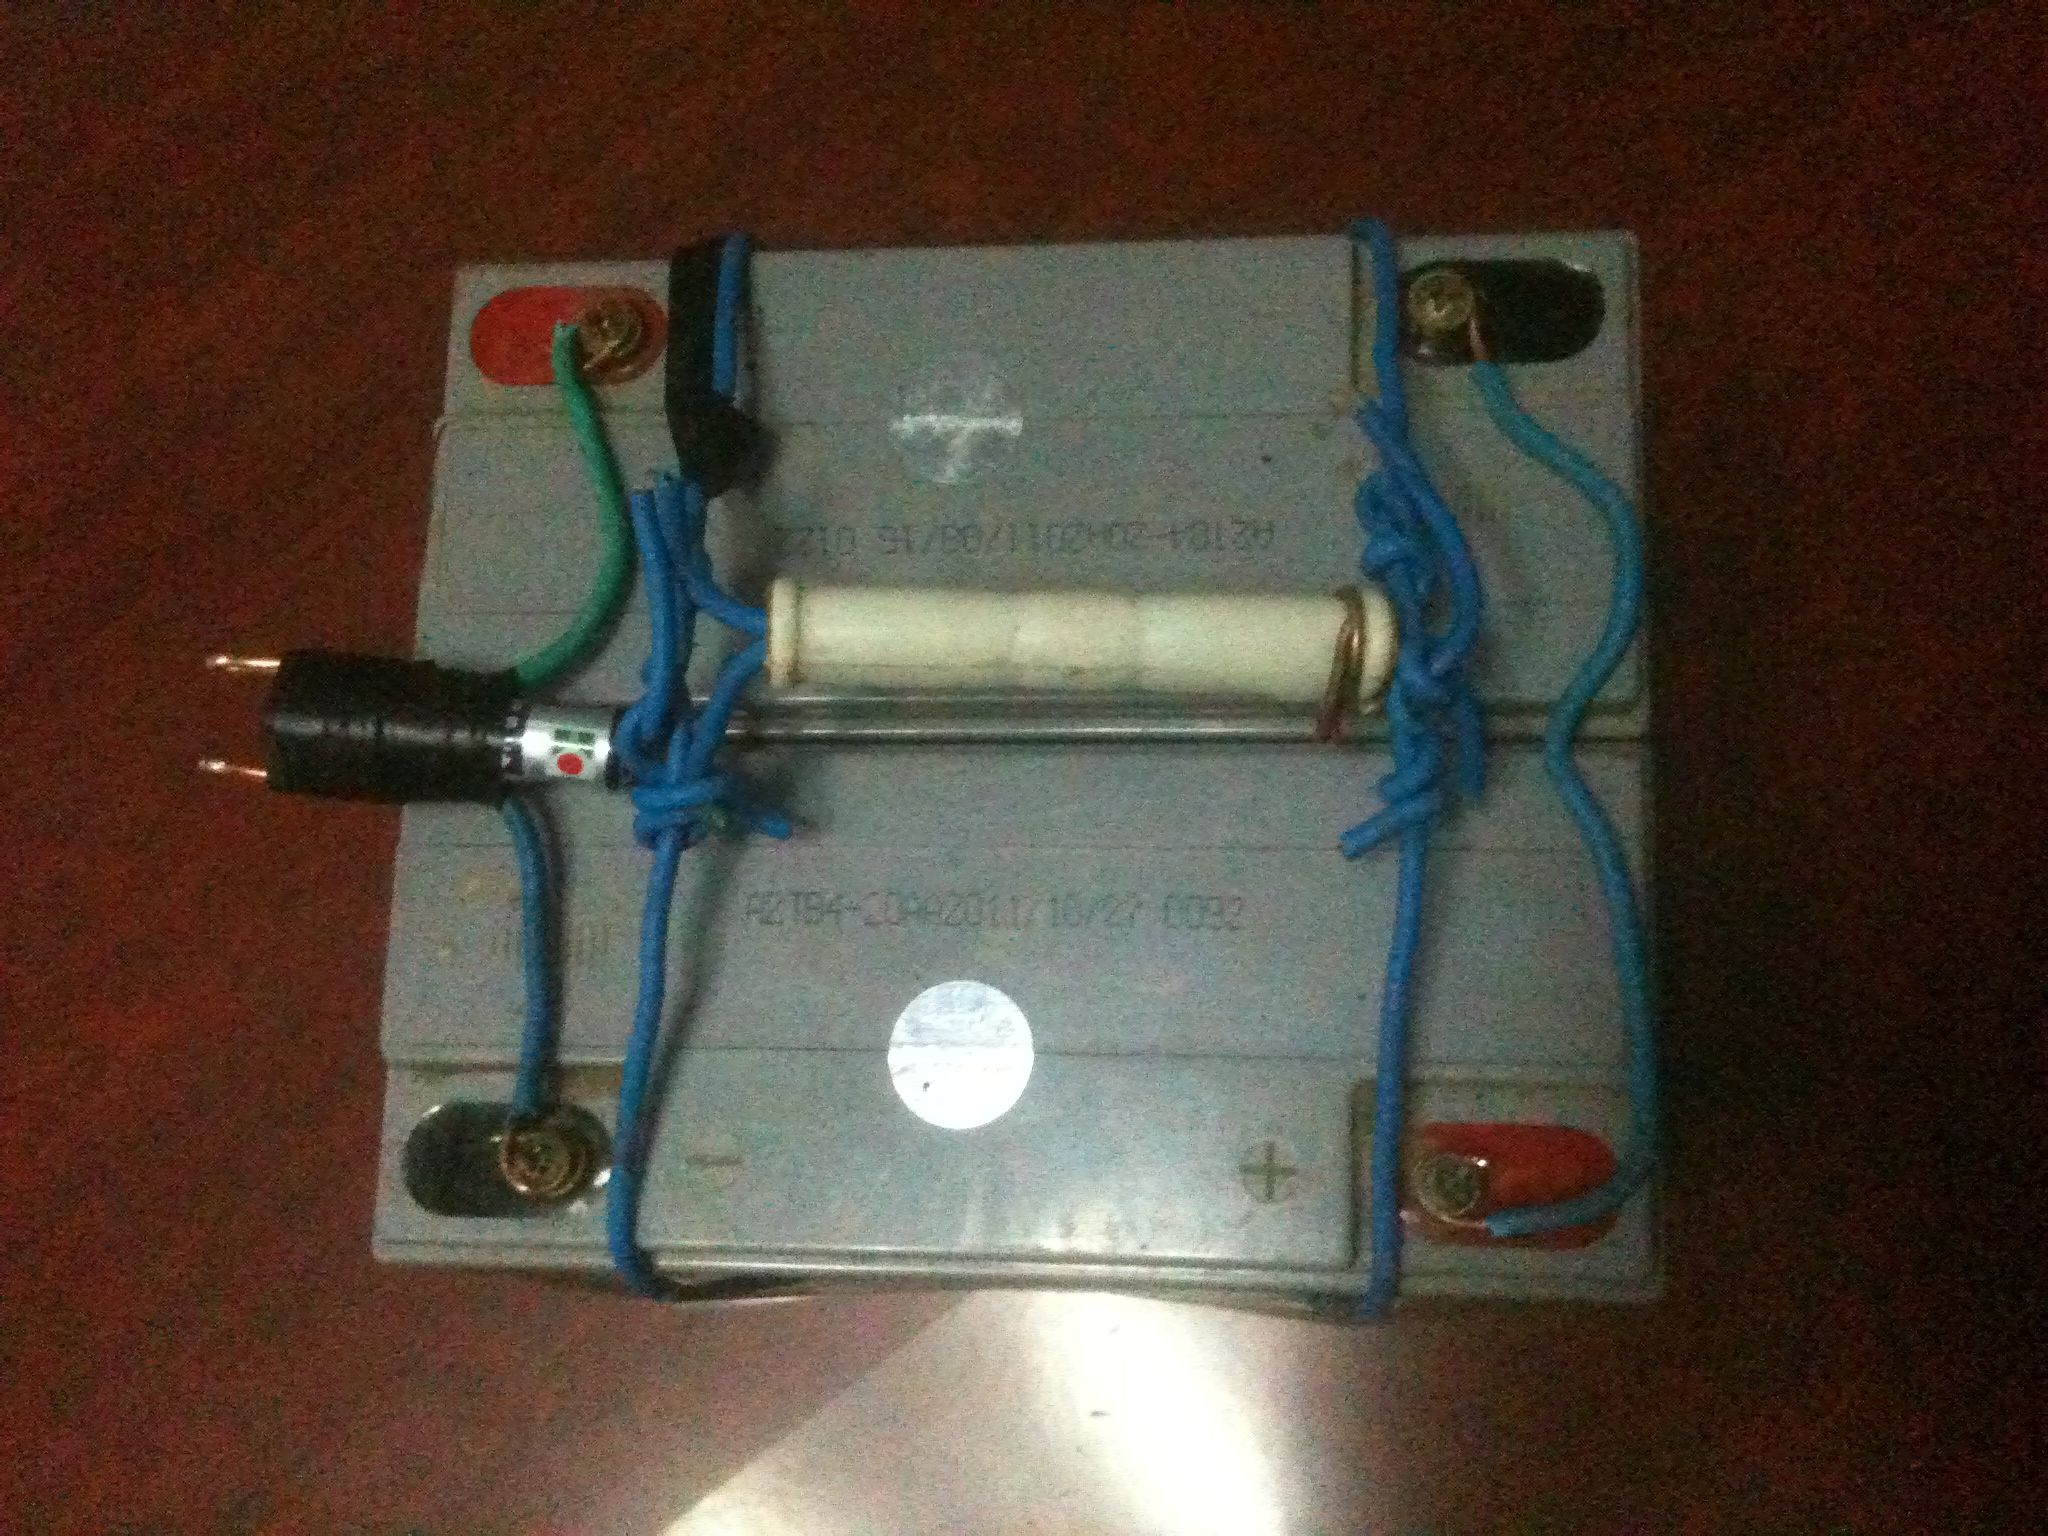 48v電動車電池可以再串聯上一塊12v的電池嗎? 48v+12v圖片